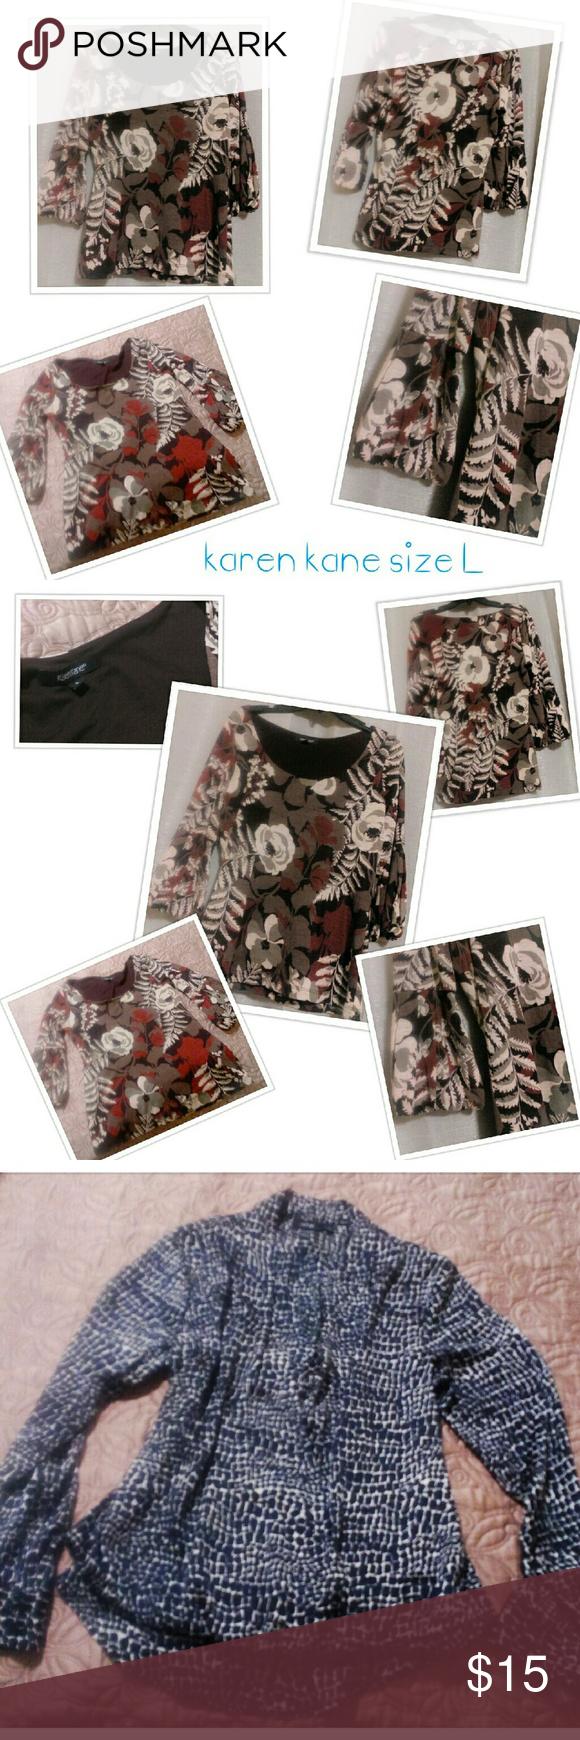 2 Piece Bundle 1 Nice Floral And Natural Tones Mid Sleeve Shirt